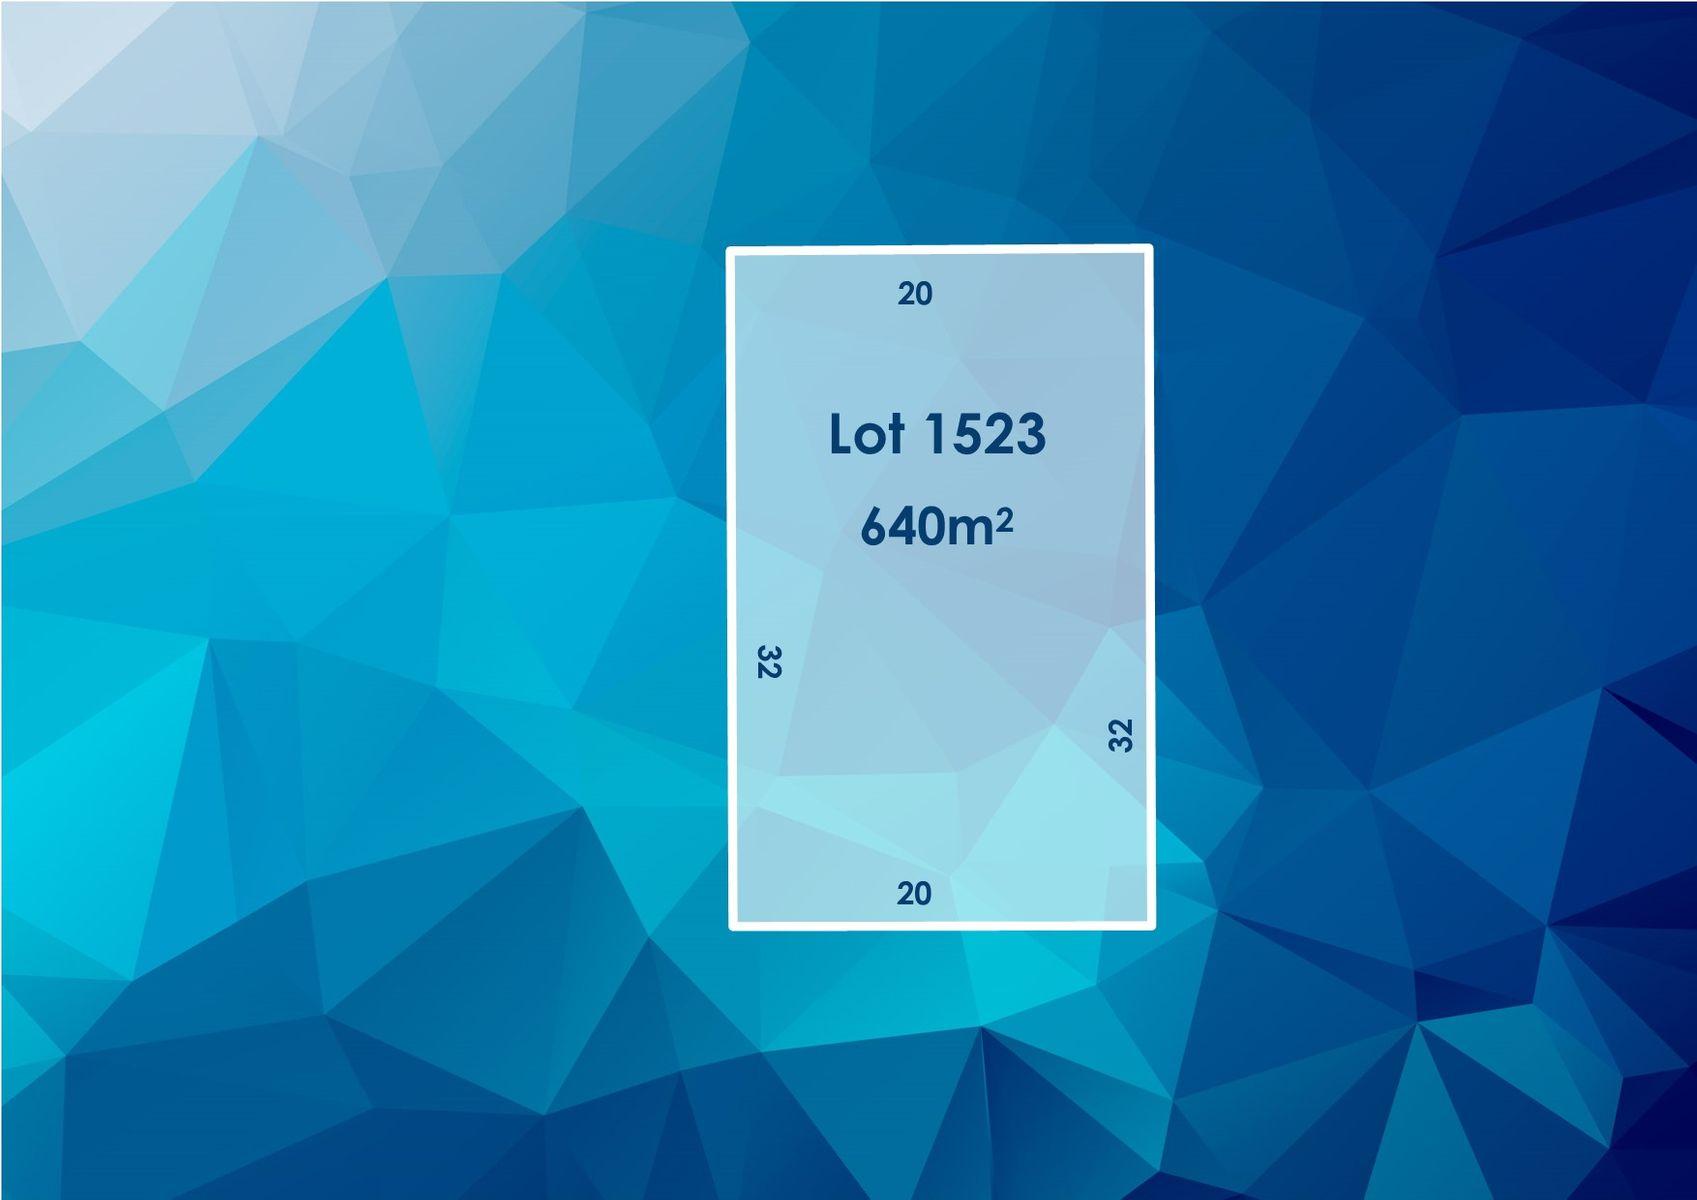 Lot 1523 Imagine Drive, Strathfieldsaye, VIC 3551